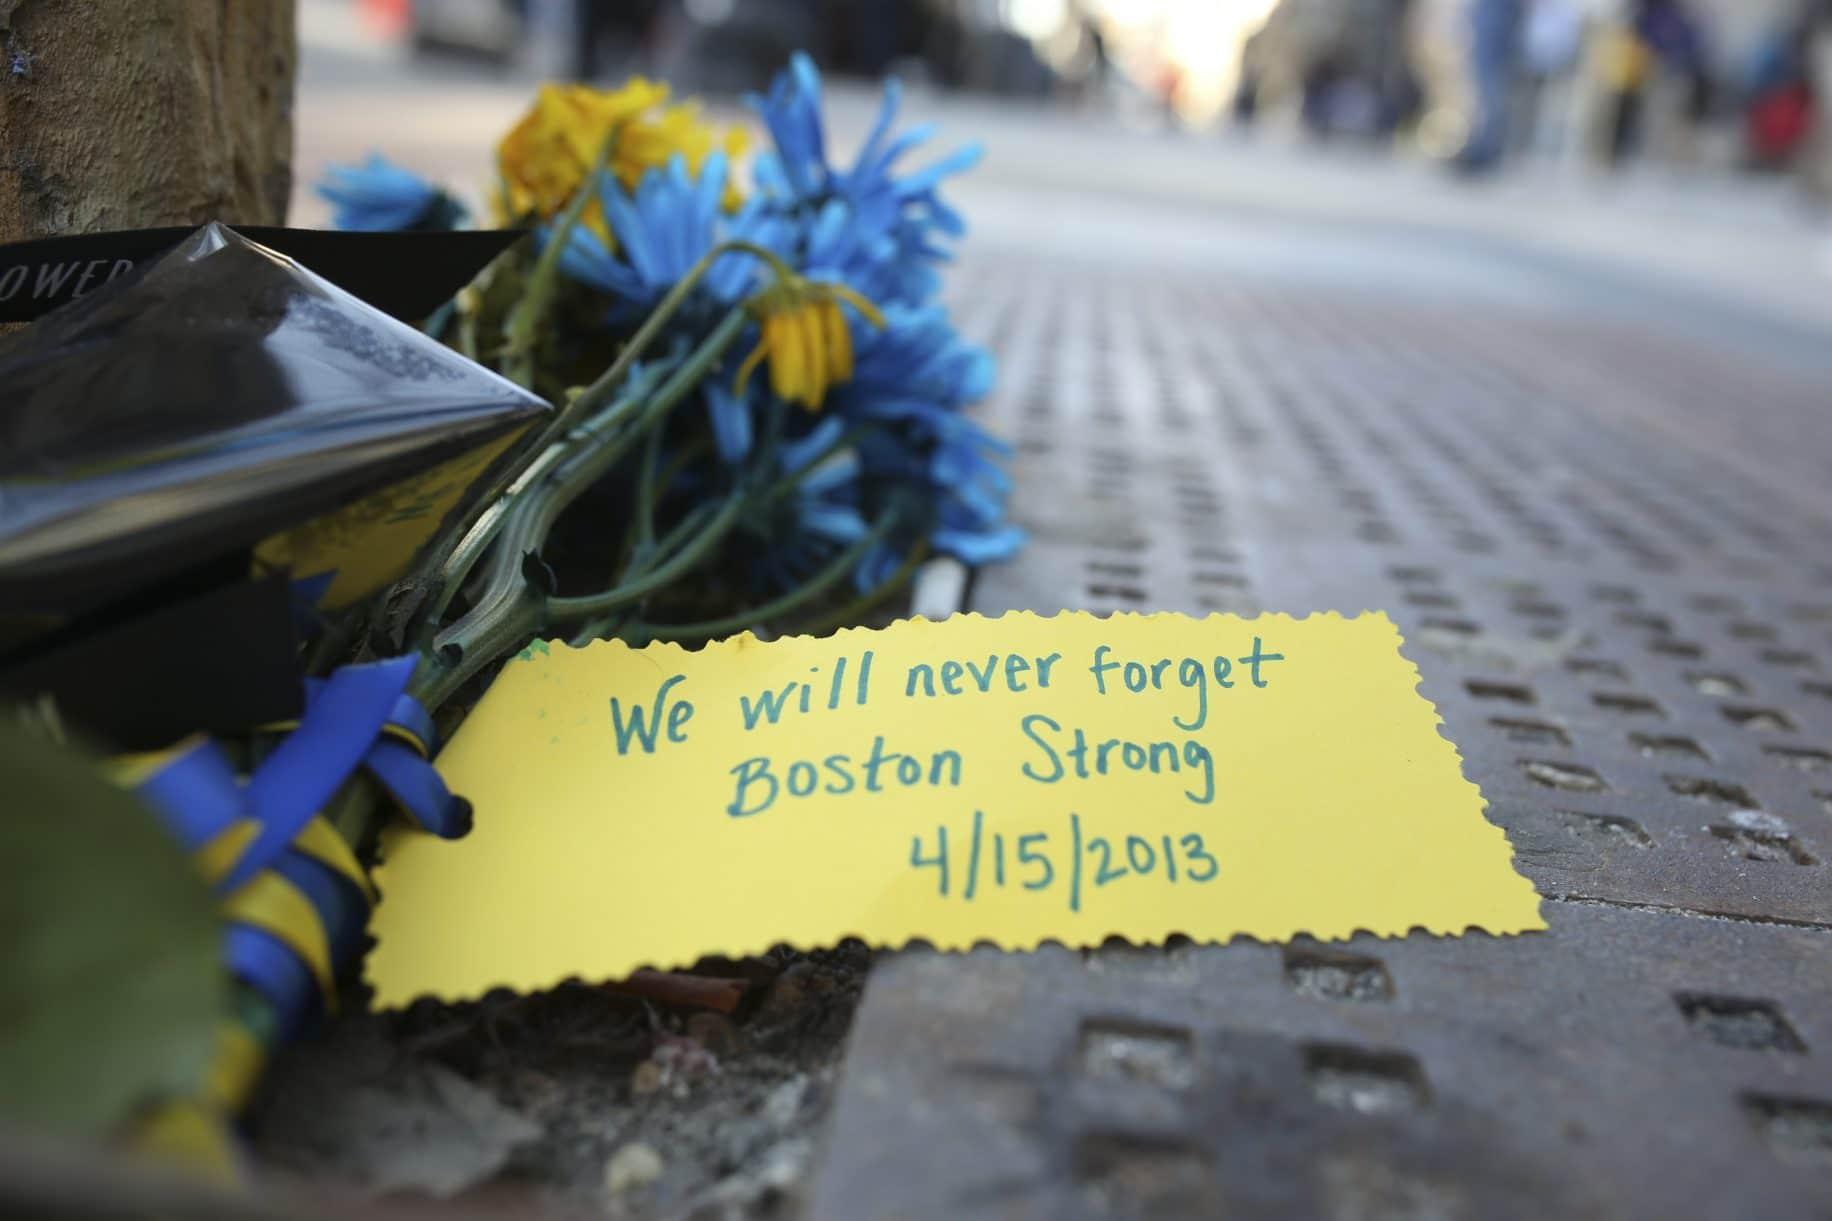 Memorial to marathon bombing victims takes shape in Boston